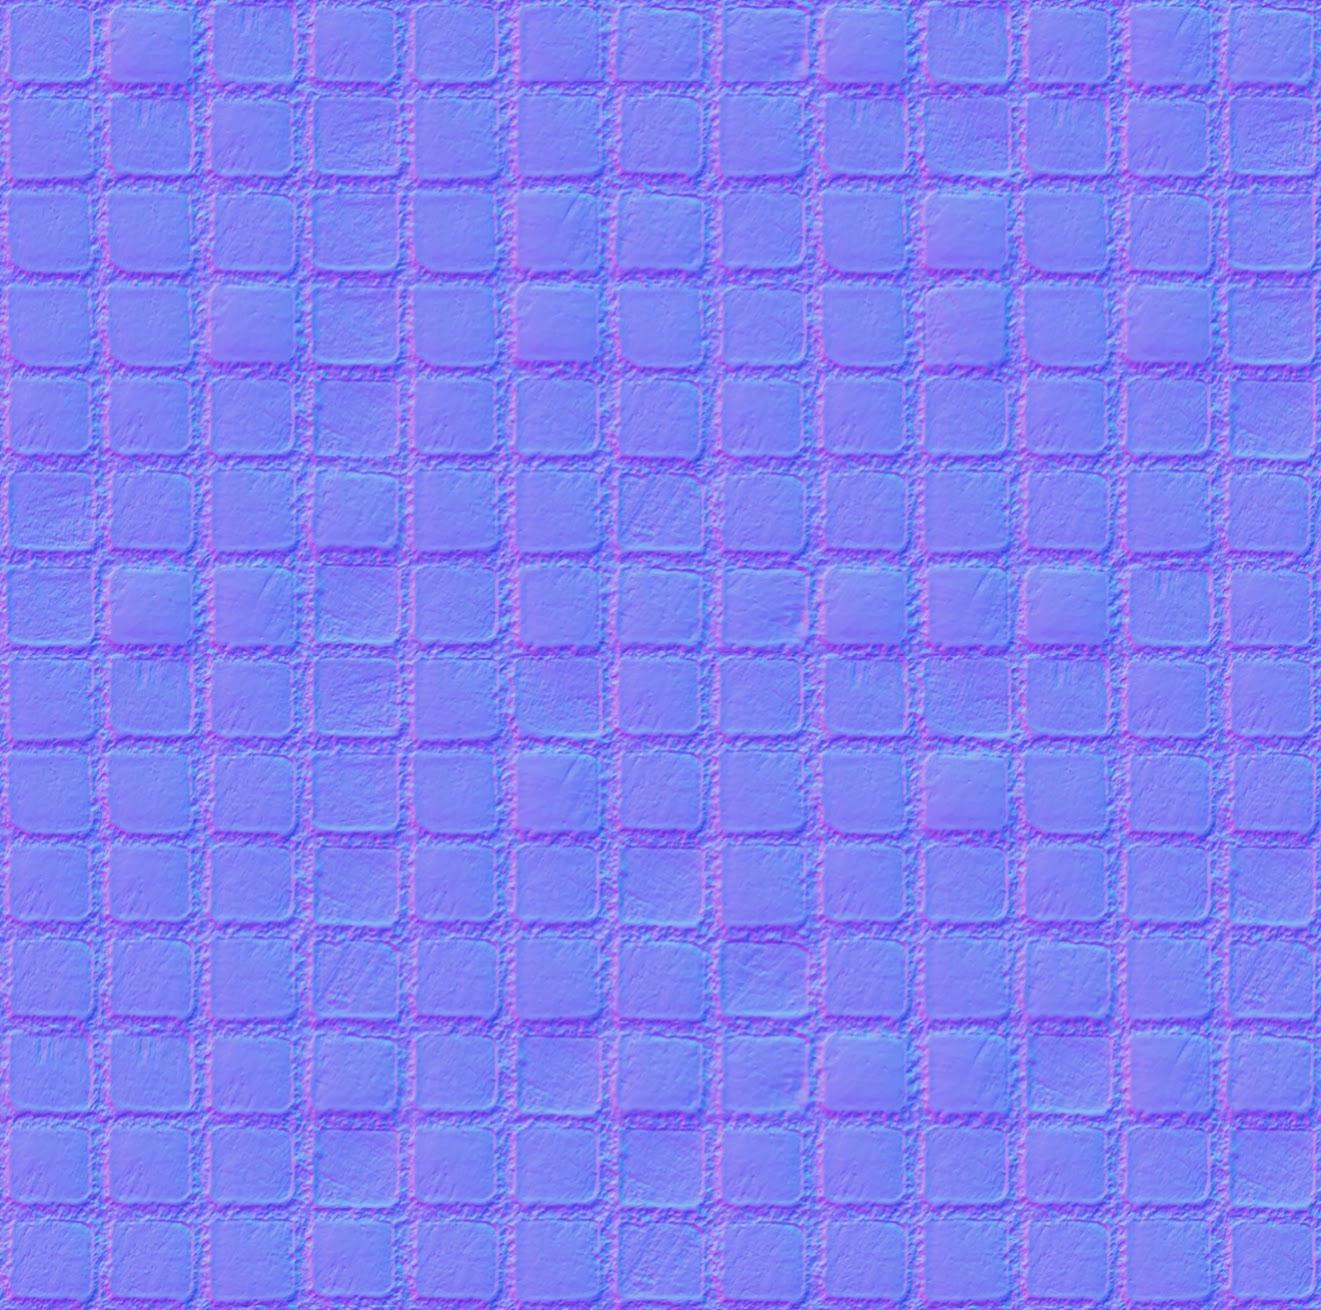 Laminate Planks >> Tileable Red Mosaic Texture + (Maps) | Texturise Free ...